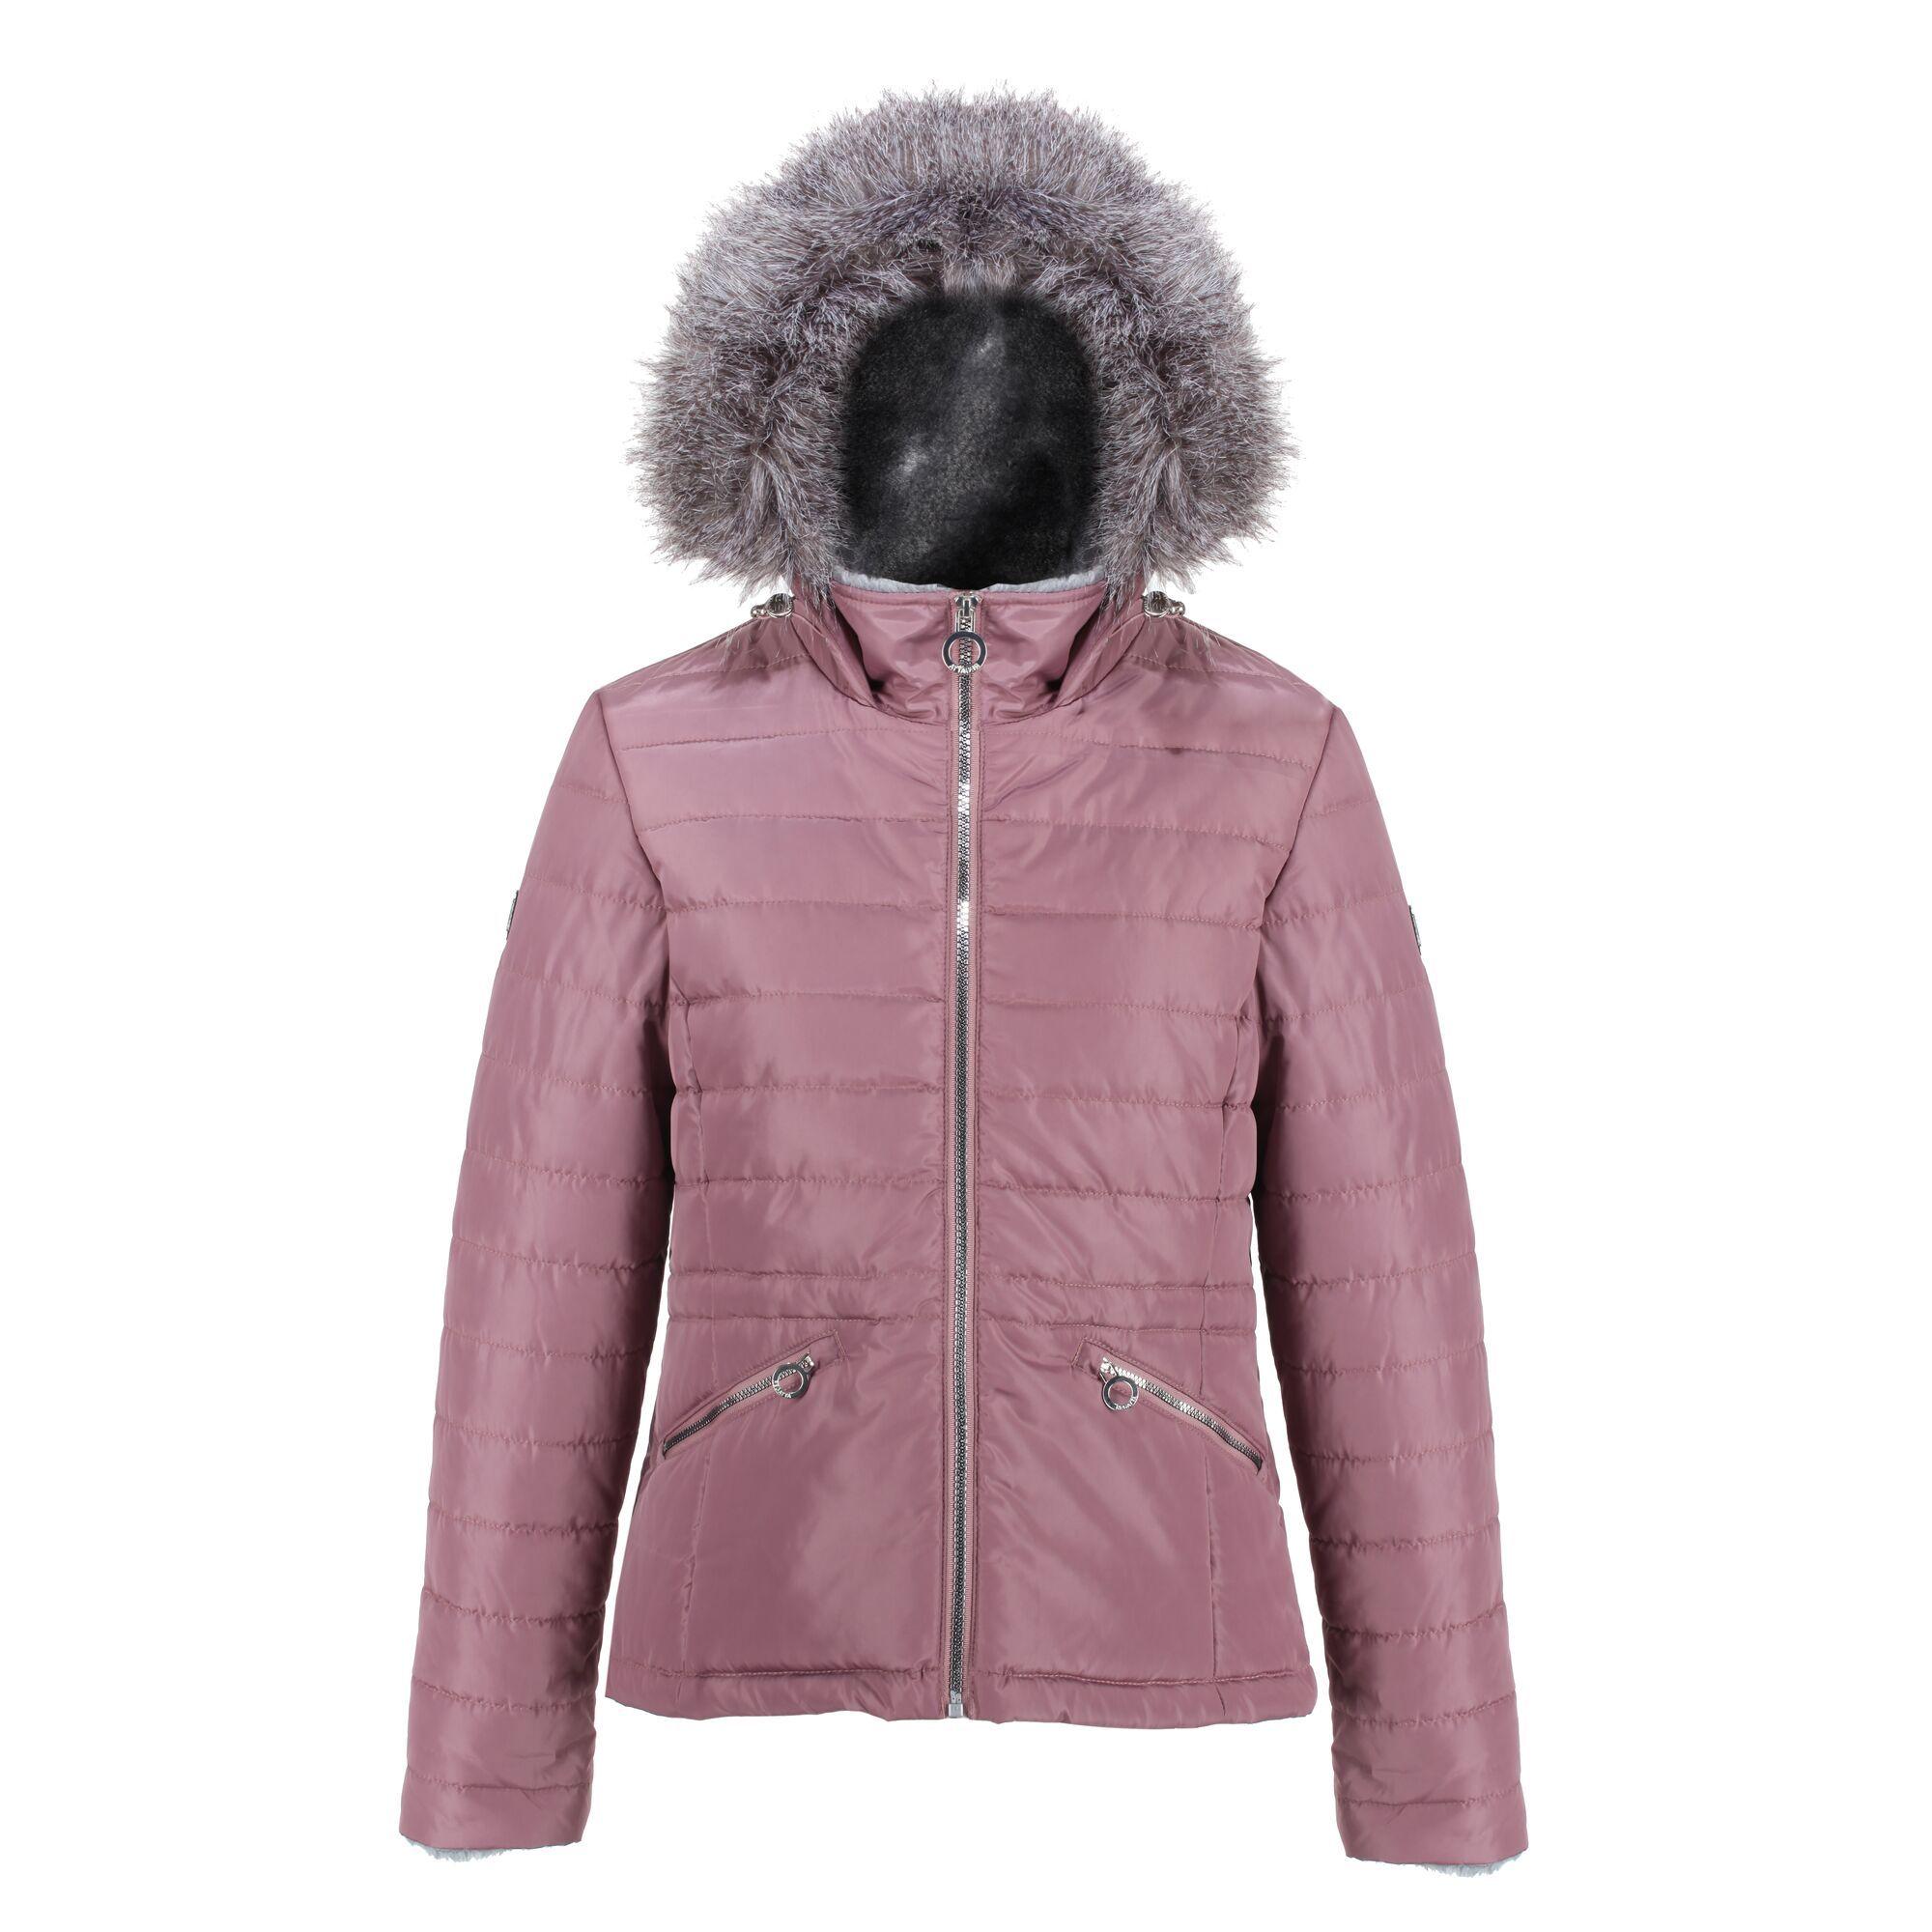 Regatta Womens/Ladies Westlynn Quilted Insulated Jacket (14 UK) (Dusky Heather)